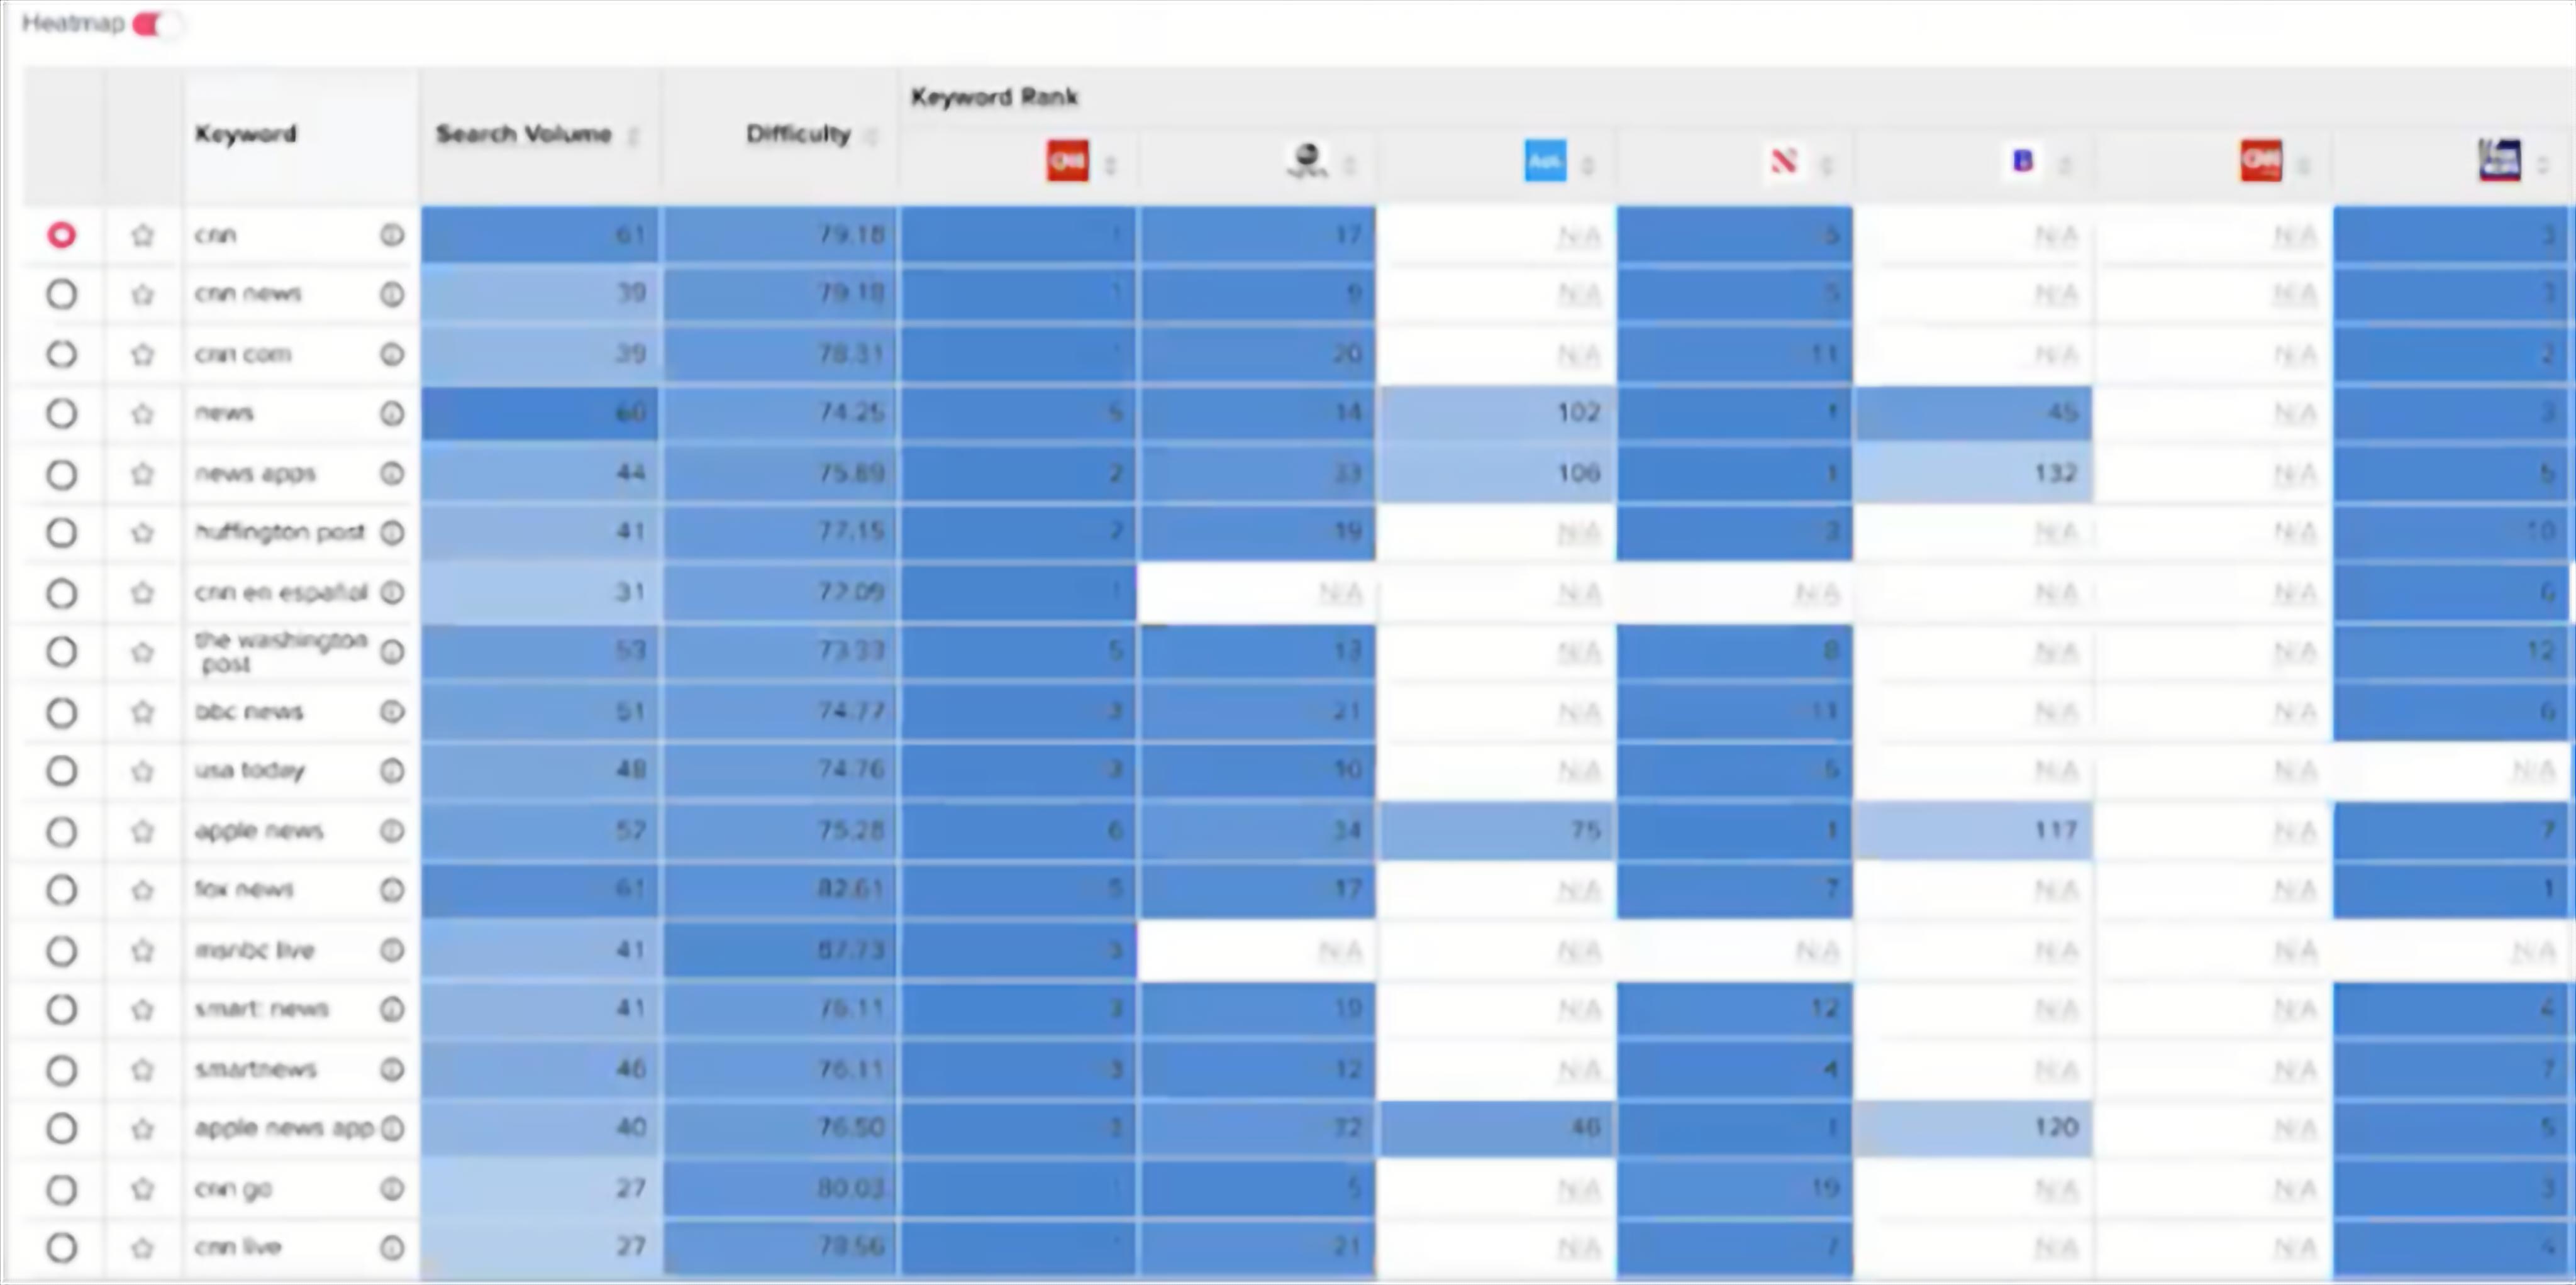 Mobile Keyword Ranking - CNN search